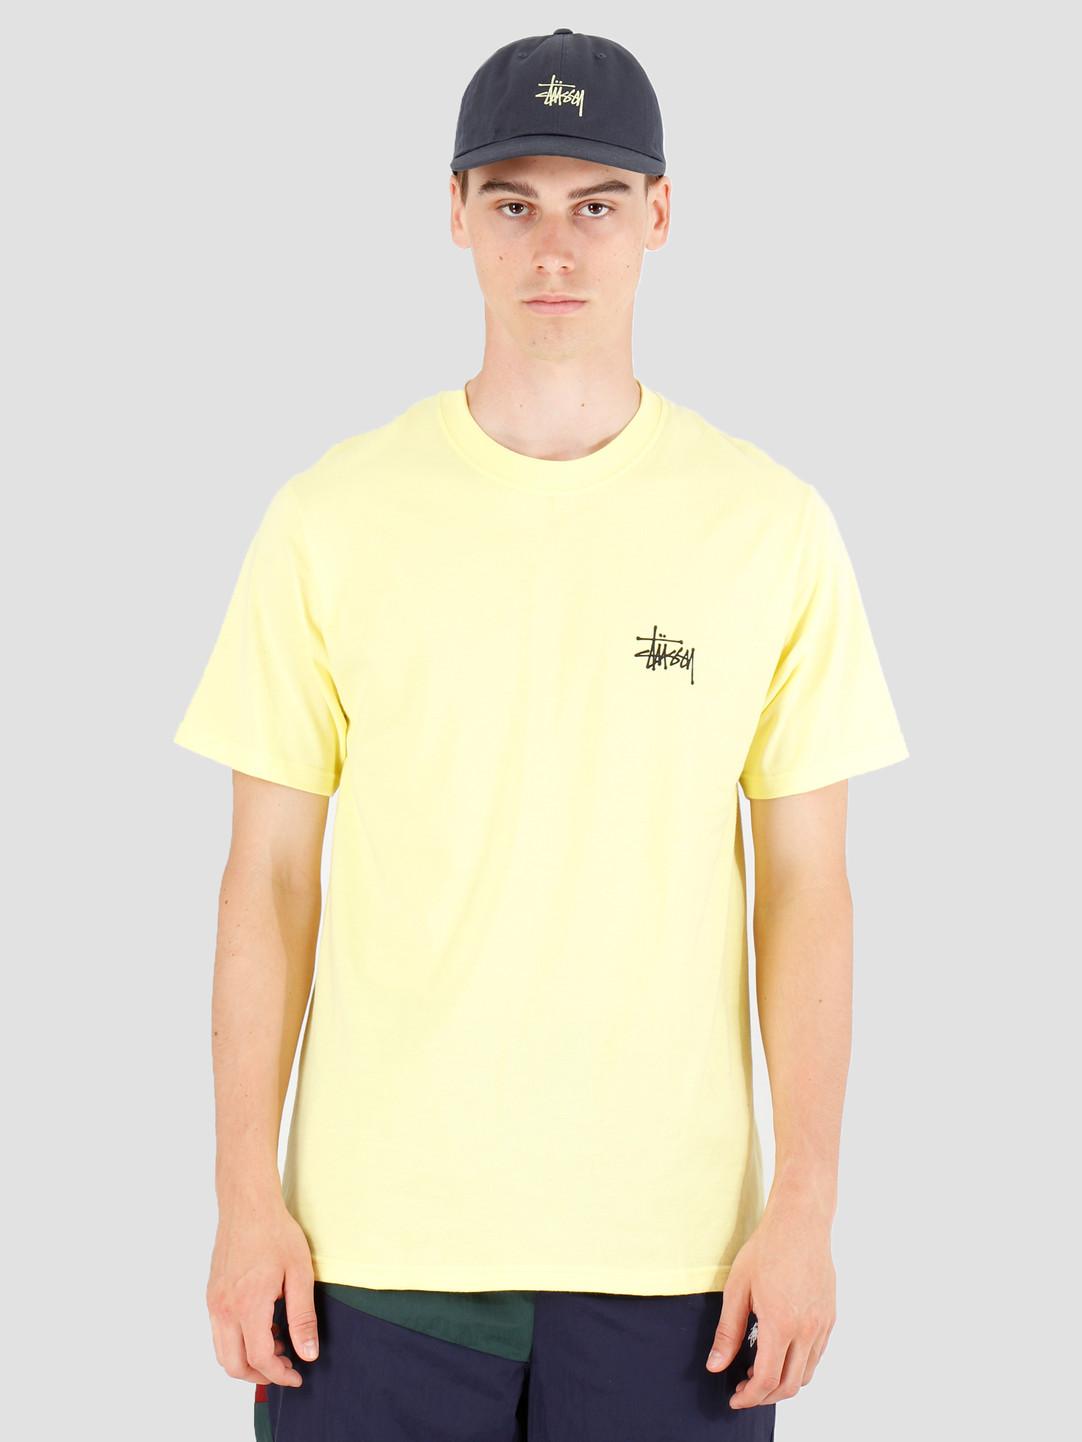 Stussy Stussy Basic Stussy T-Shirt Lemon 1904416